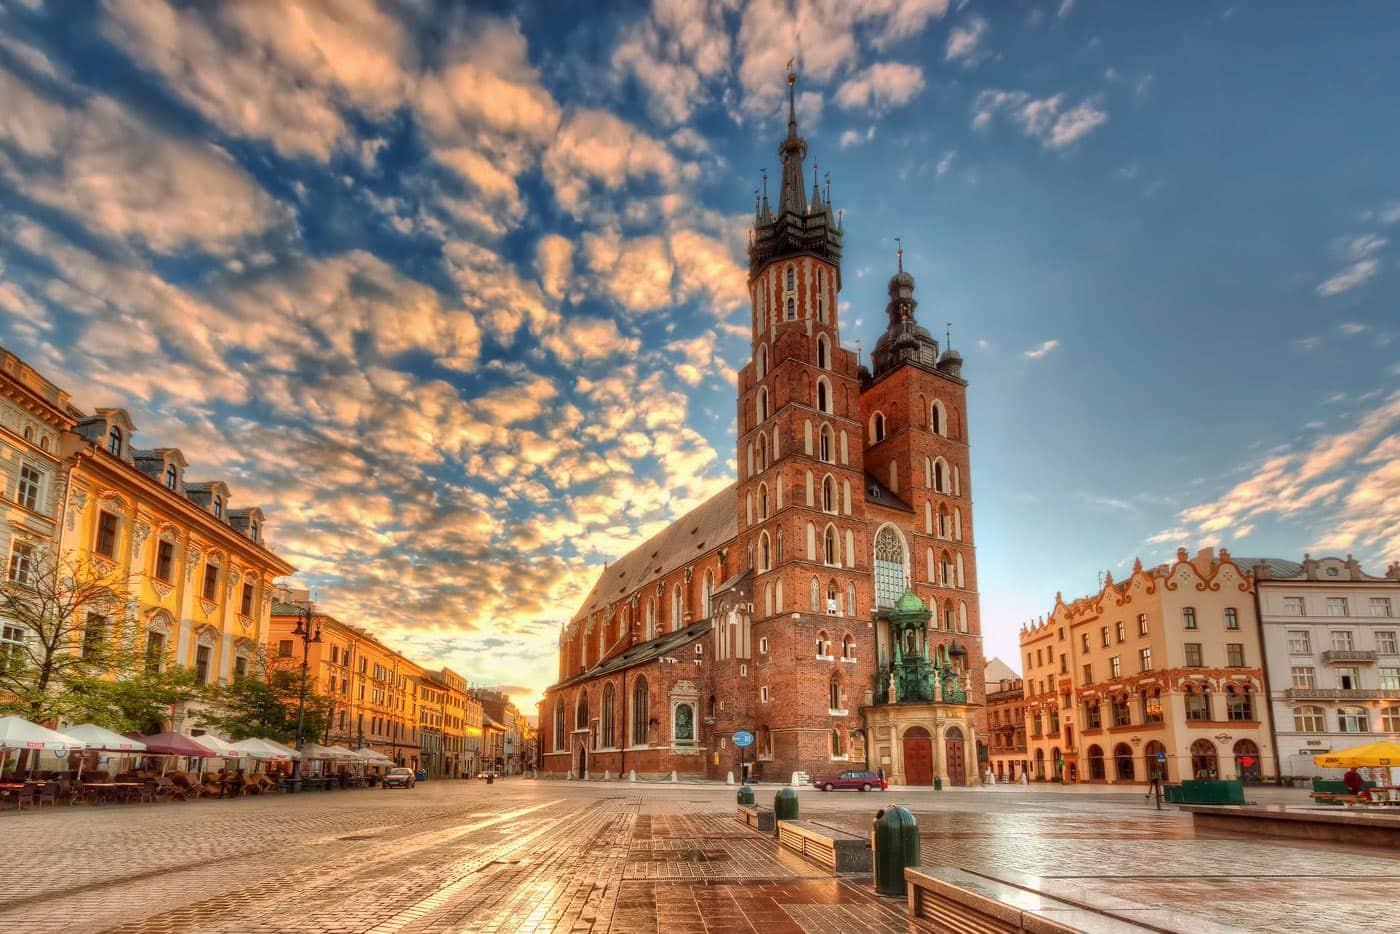 St. Mary's Basilica | Kraków, Poland